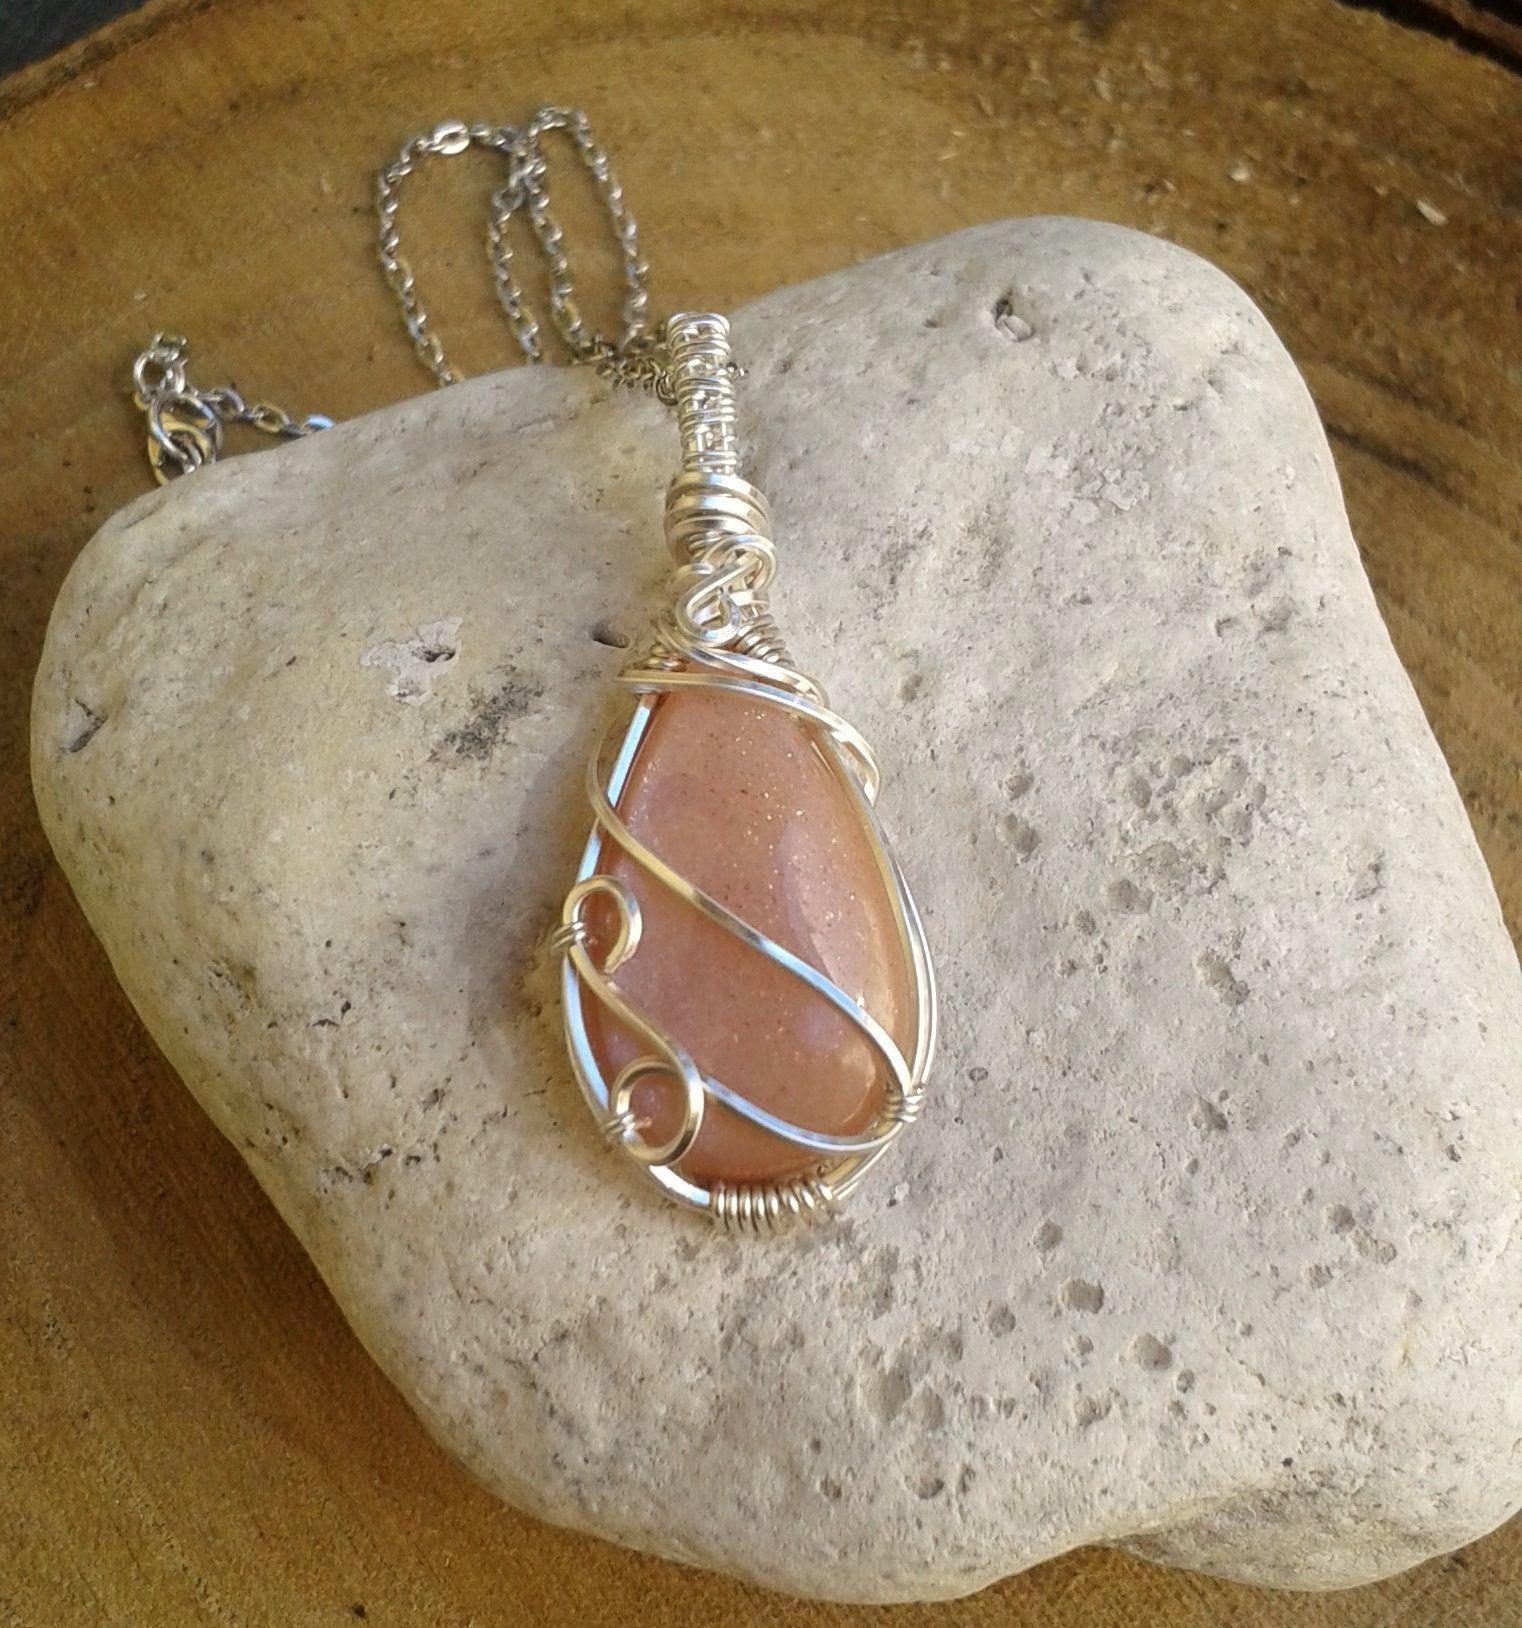 Crystal Jewelry Peach Moonstone Pendant Crystal Pendant Wiccan Moonstone pendant Wiccan Necklace Moonstone Necklace Crystal Necklace